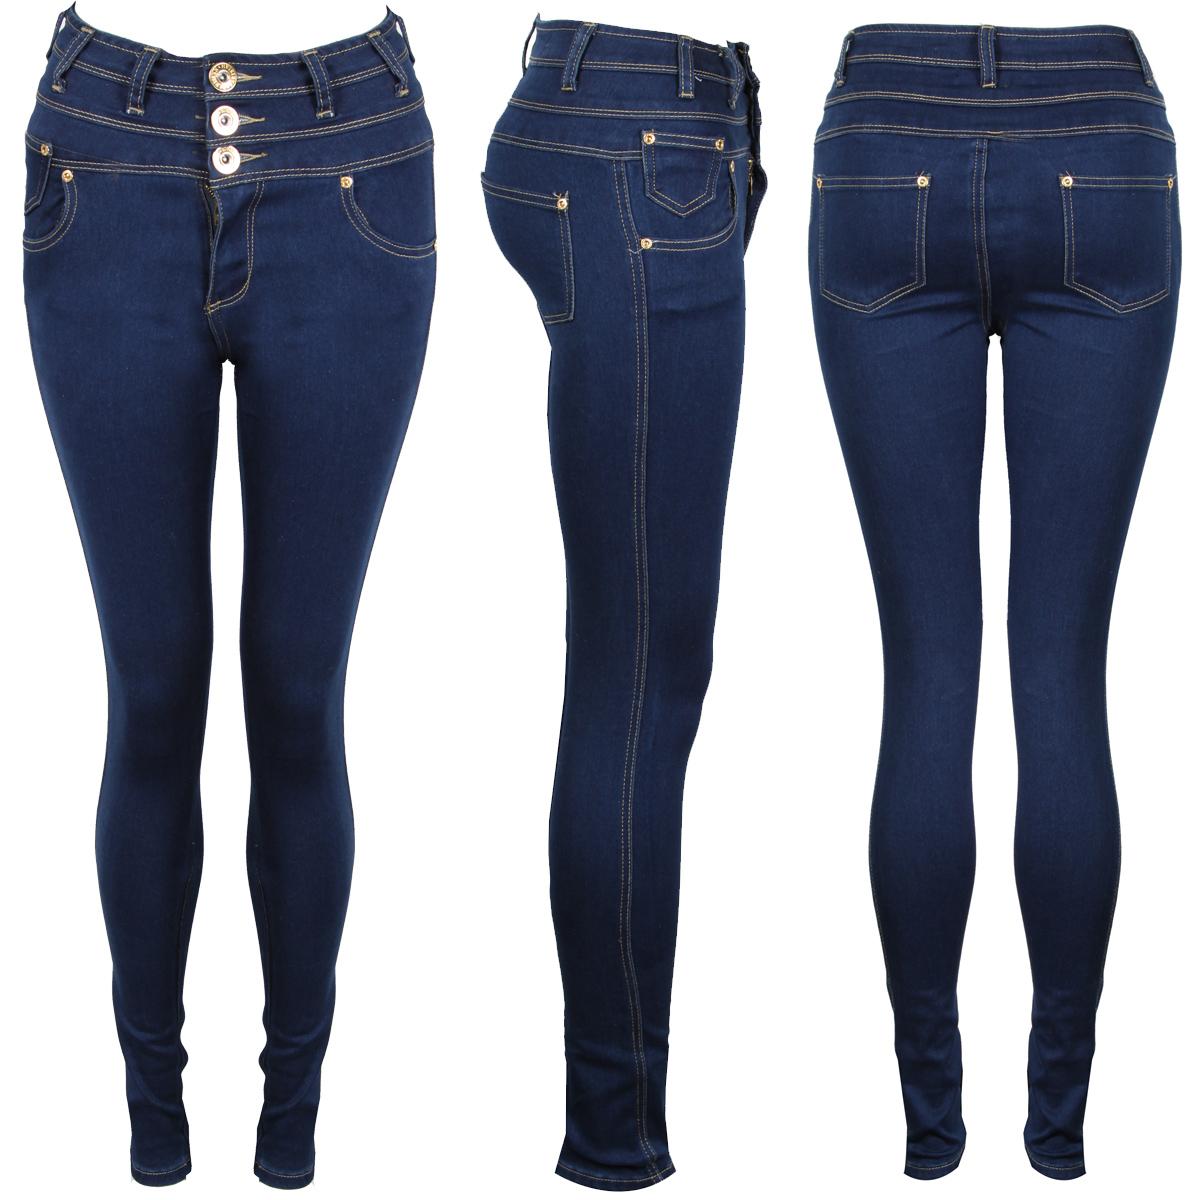 new womens blue denim super skinny high waist button up jeans 6 8 10 12 14 ebay. Black Bedroom Furniture Sets. Home Design Ideas